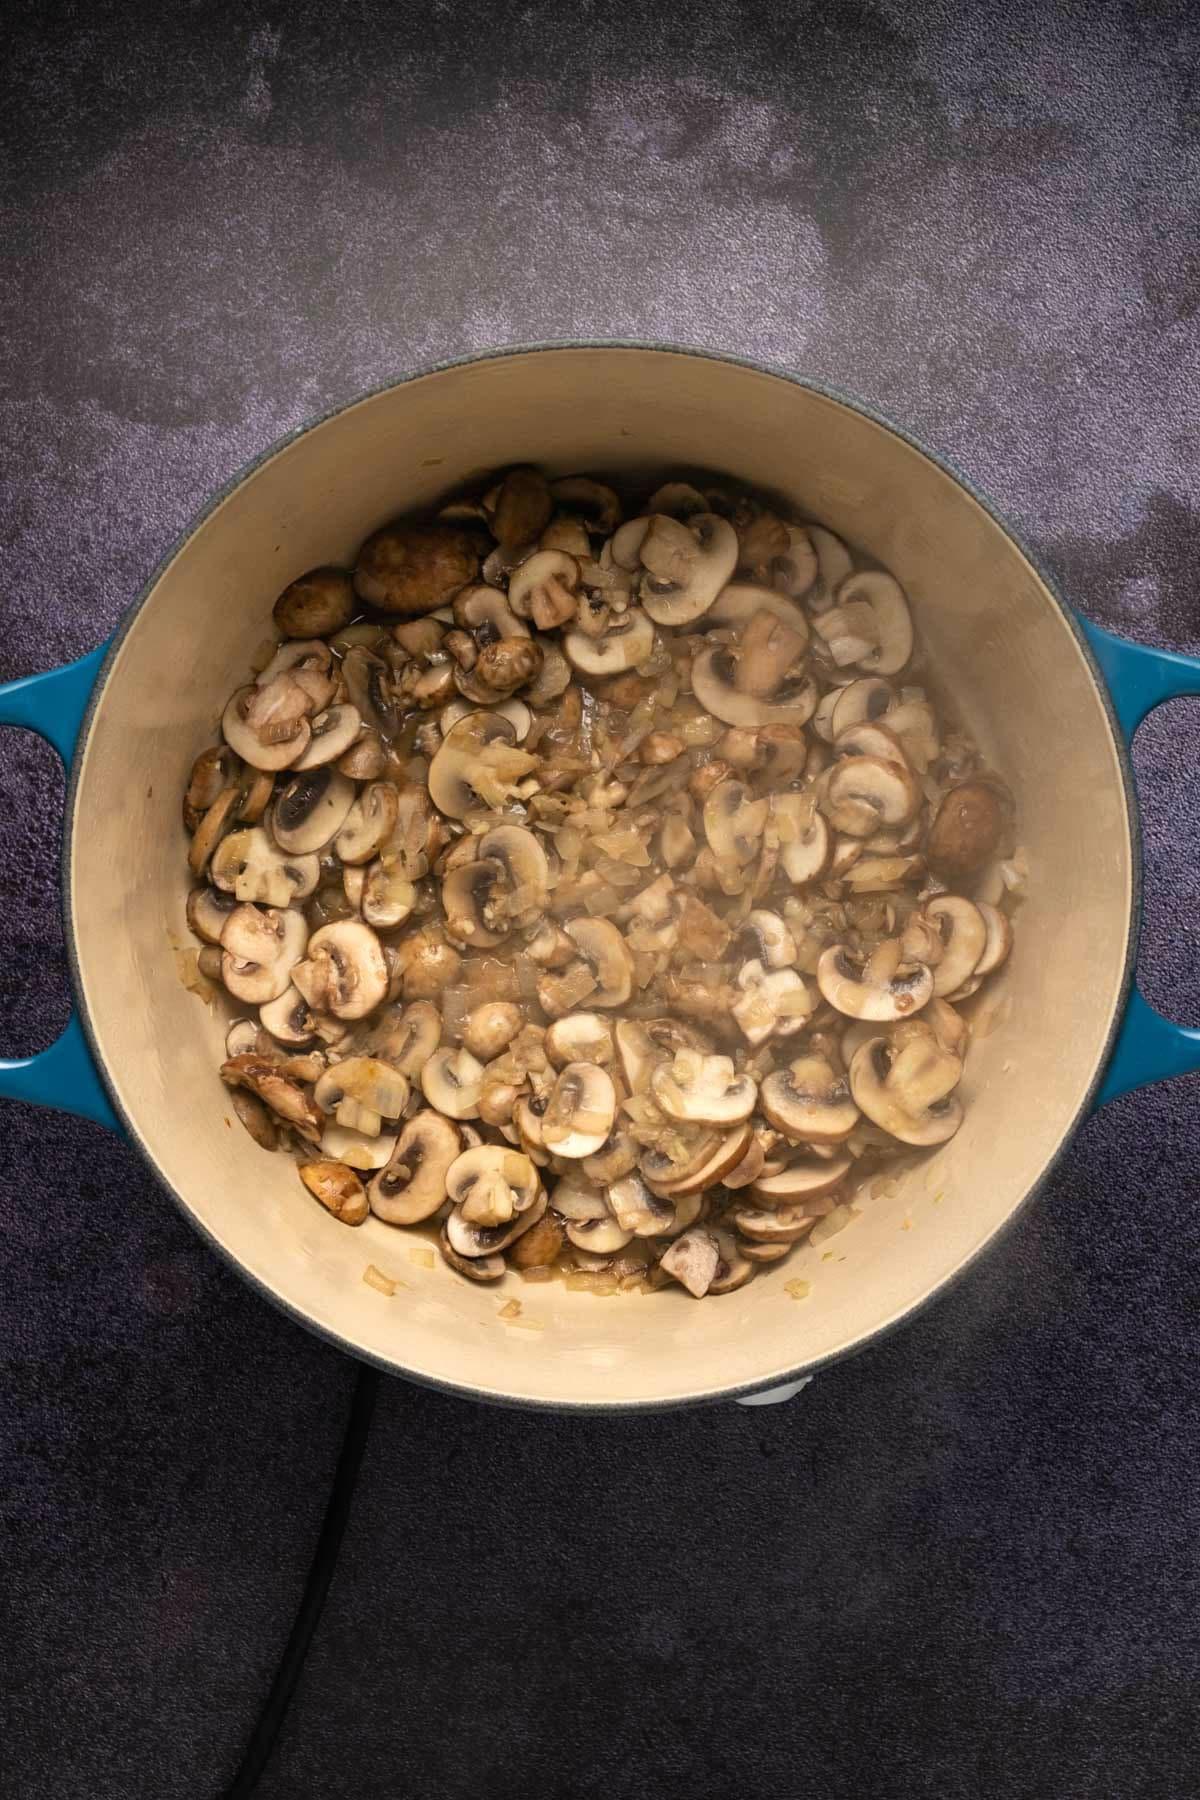 Sautéed mushrooms and onions in a pot.